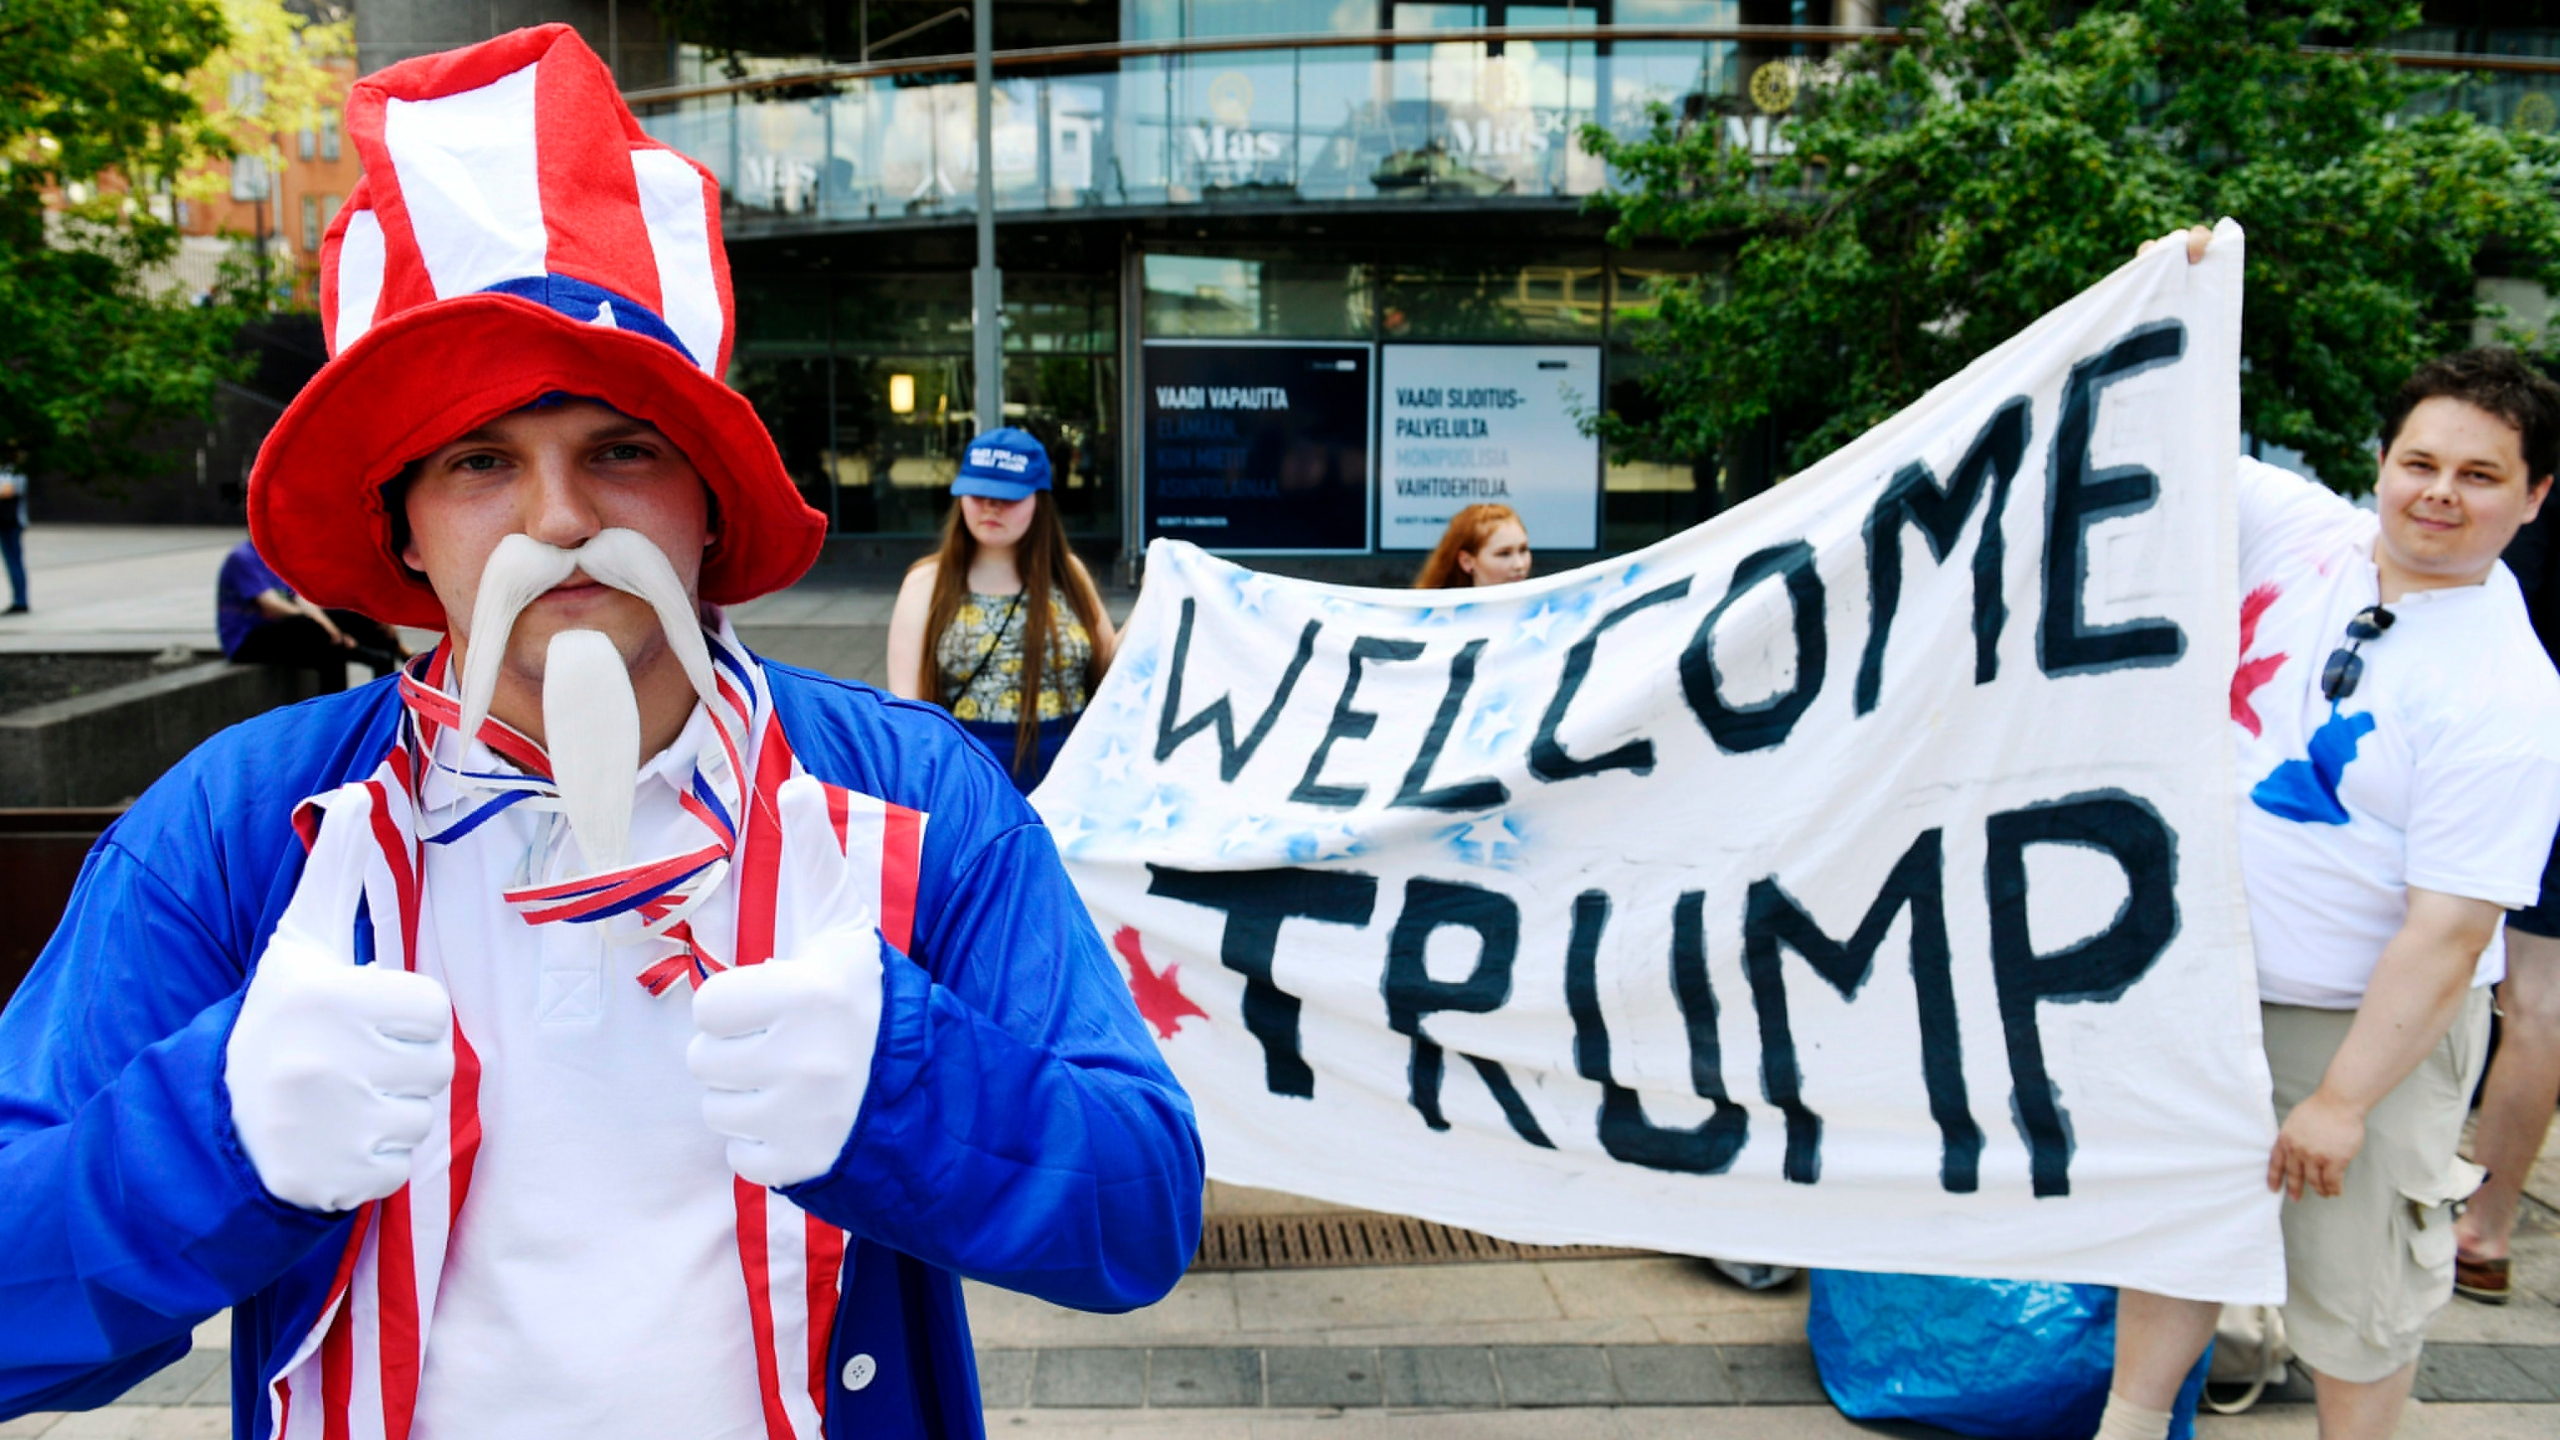 Finland_Trump_74688-159532.jpg49998698